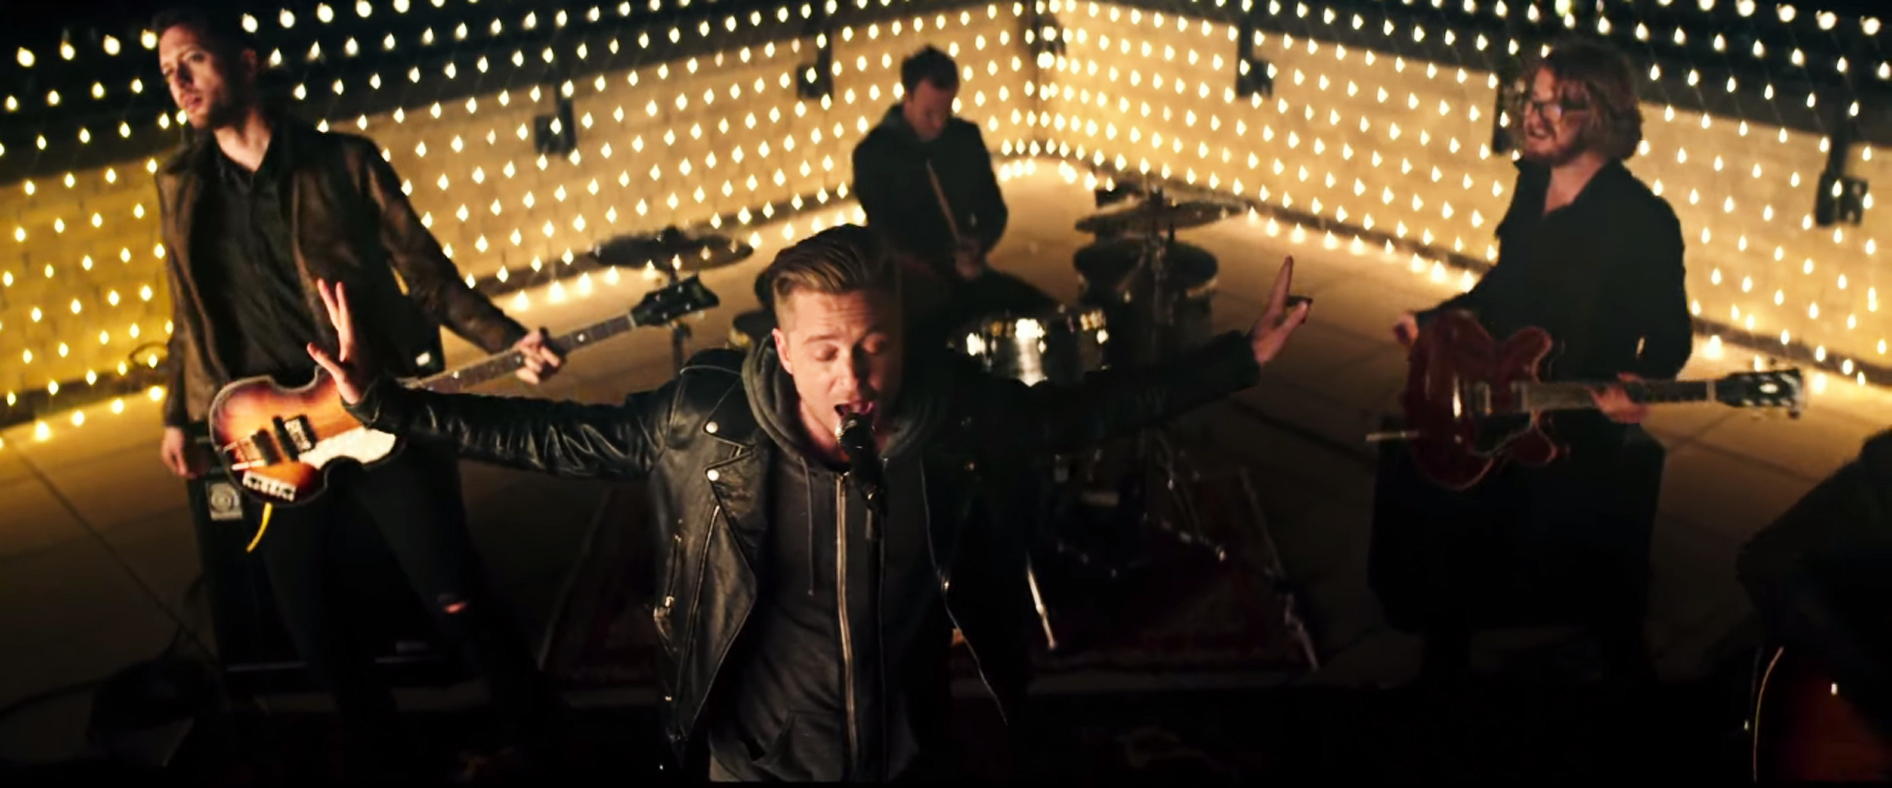 2020 Honda Civic Tour Featuring Onerepublic  July 29 OneRepublic Plot Massive Tour, Unveil Cathartic New Video